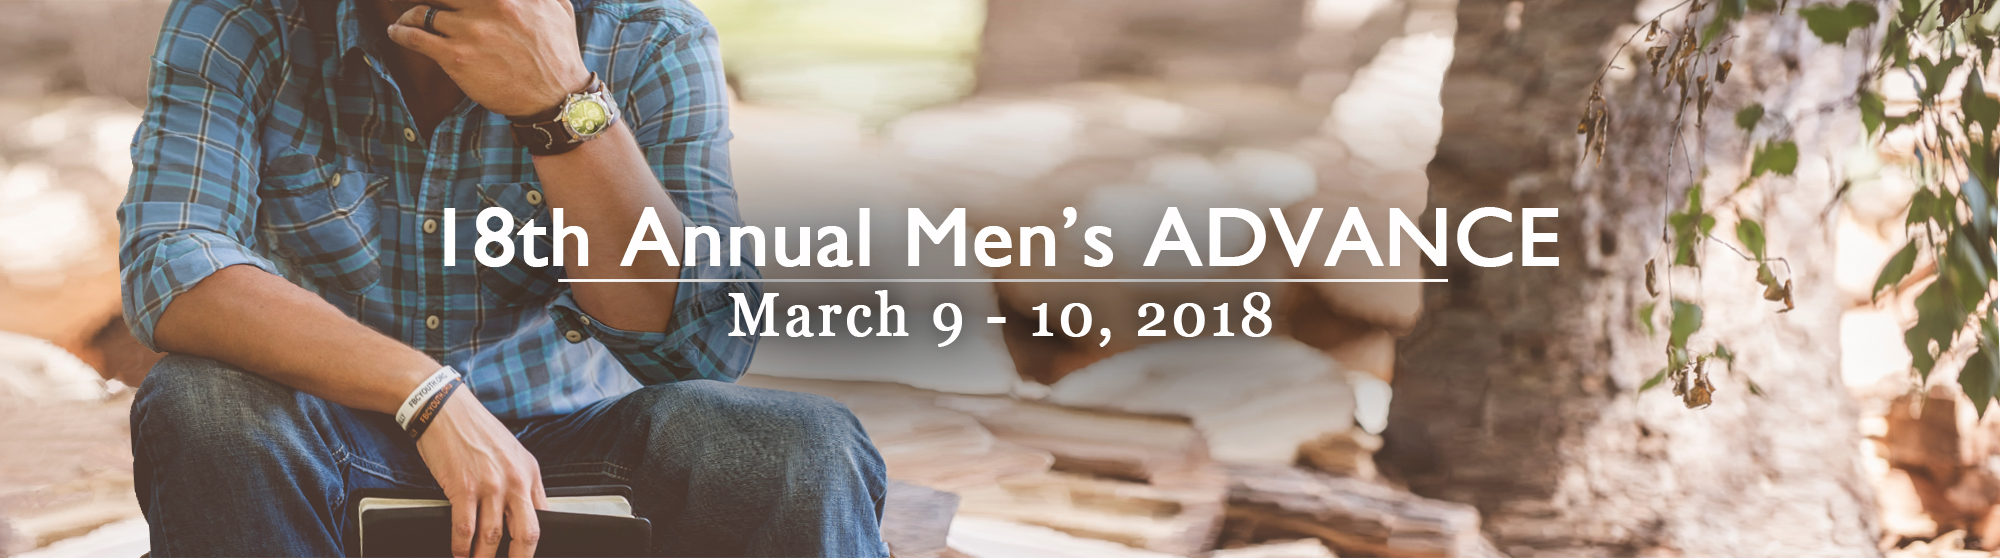 Men s advance 2018